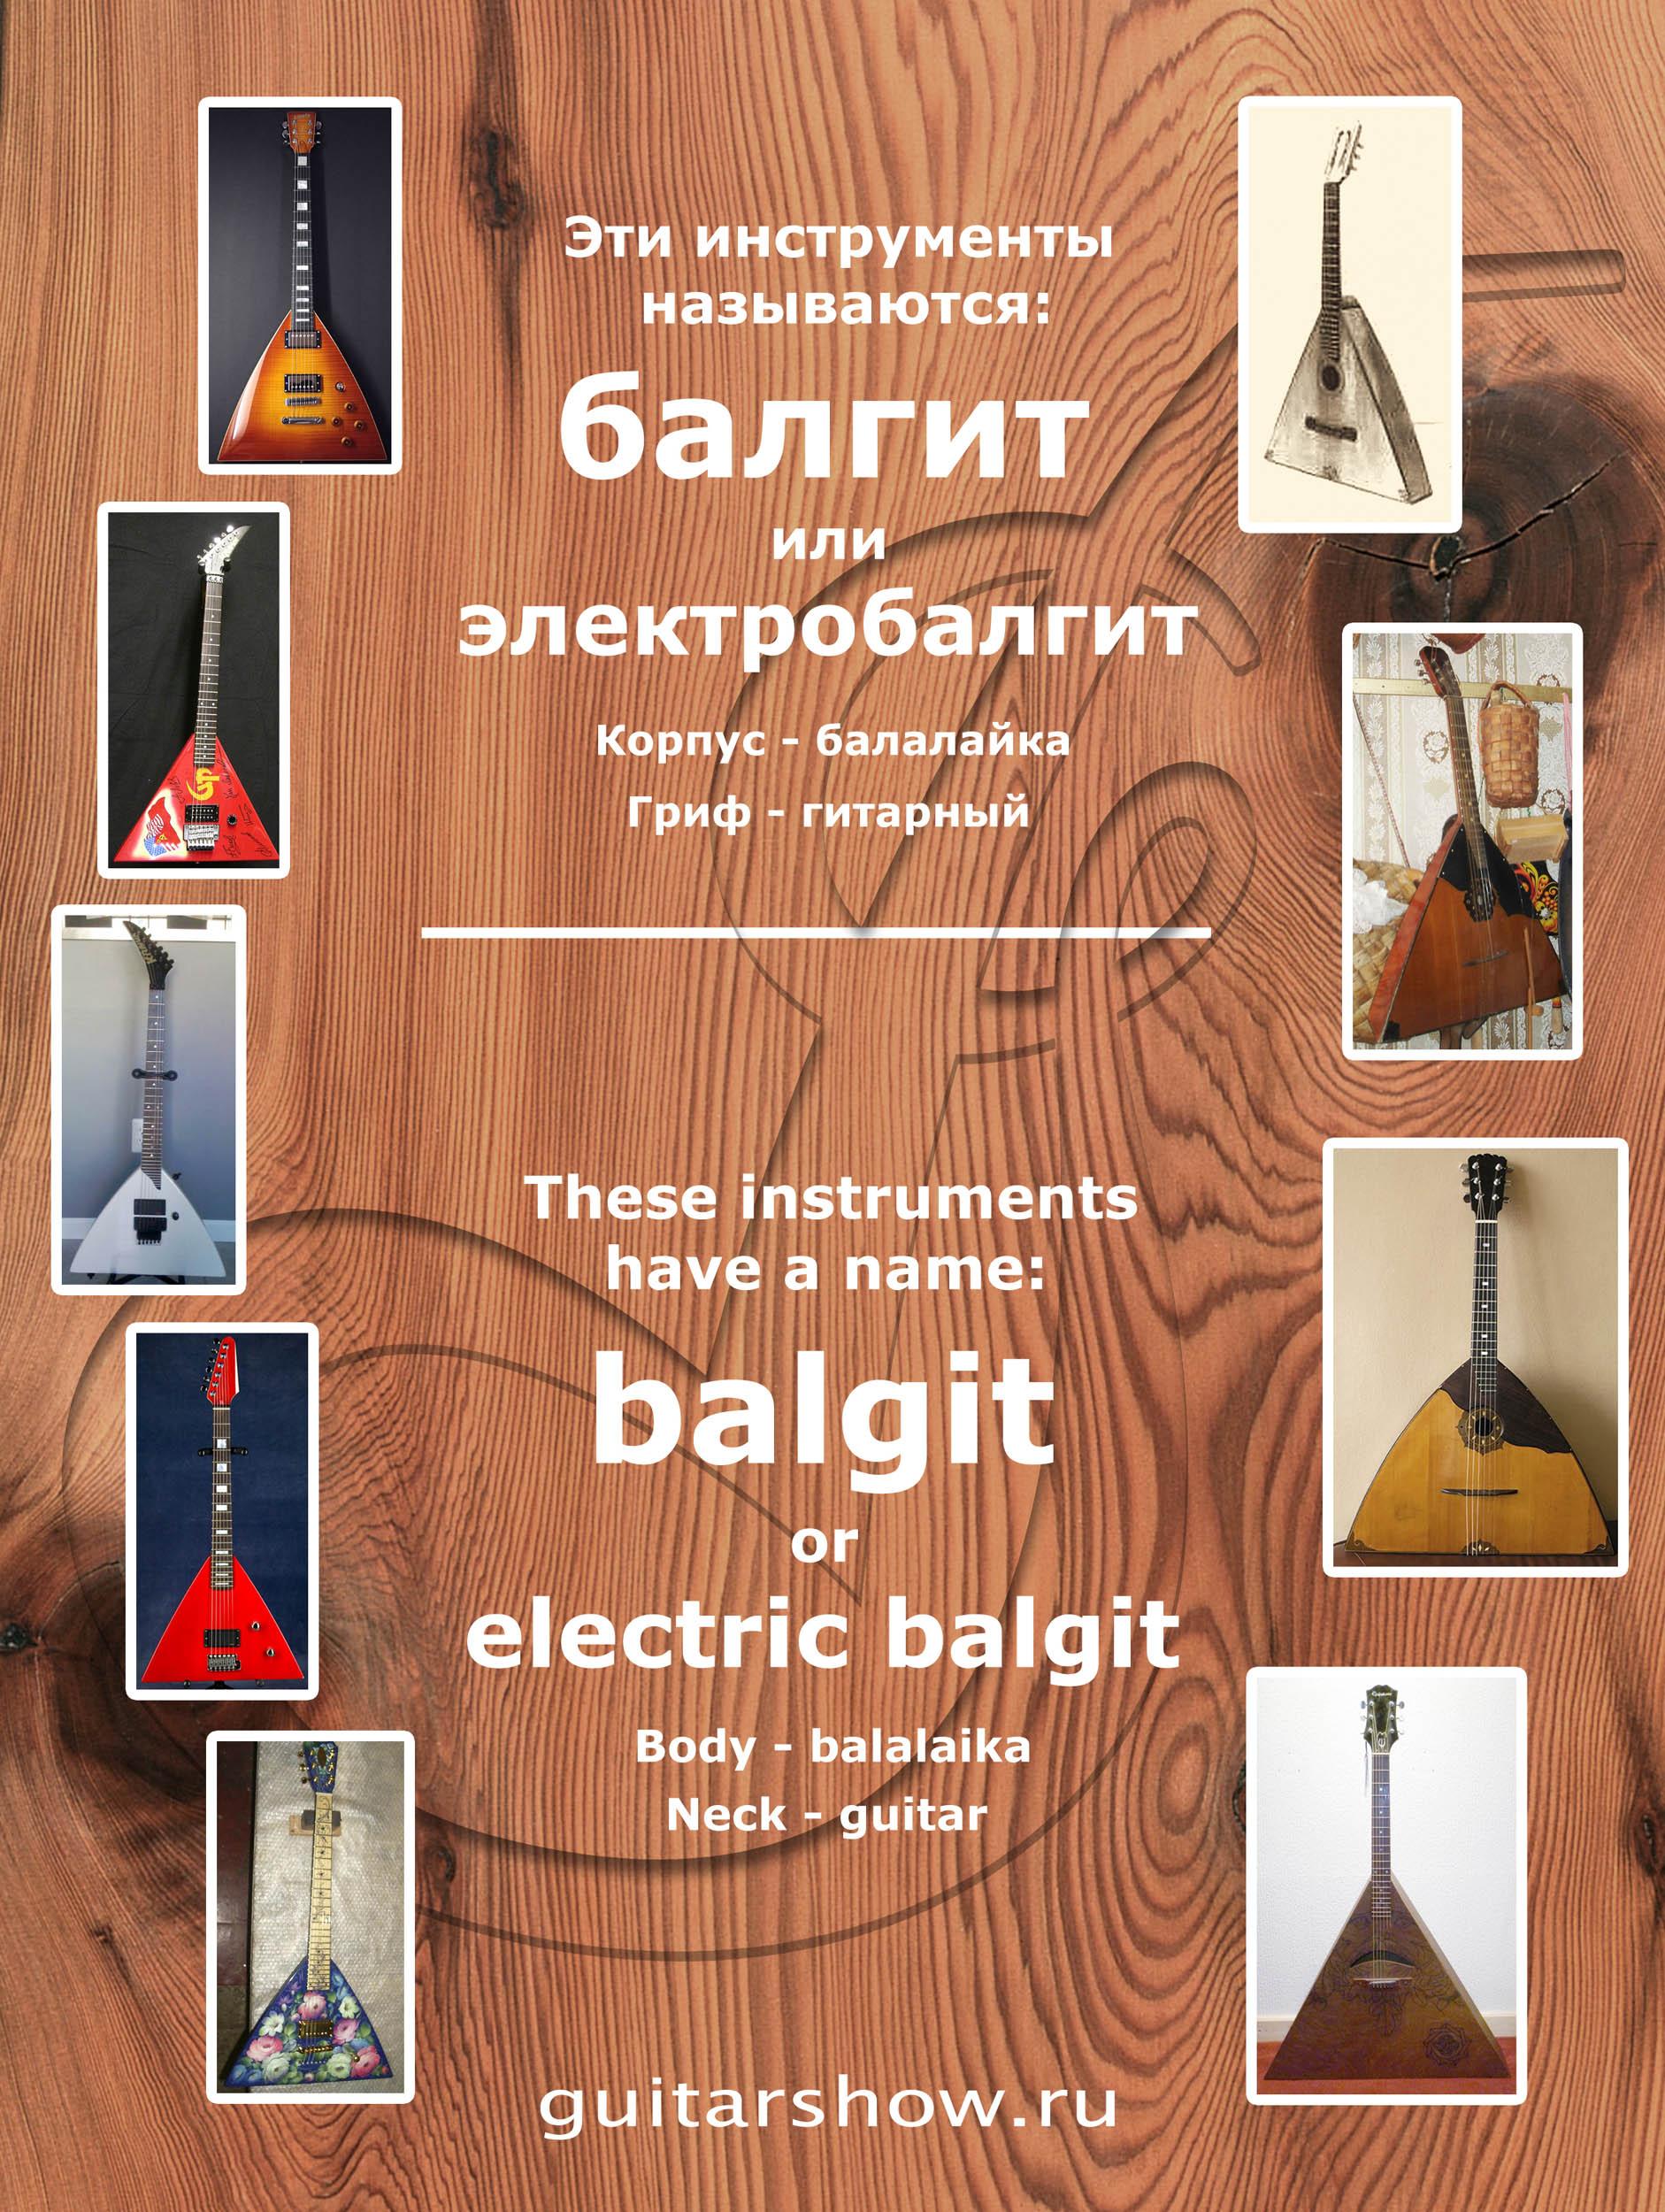 balgit_name_gs